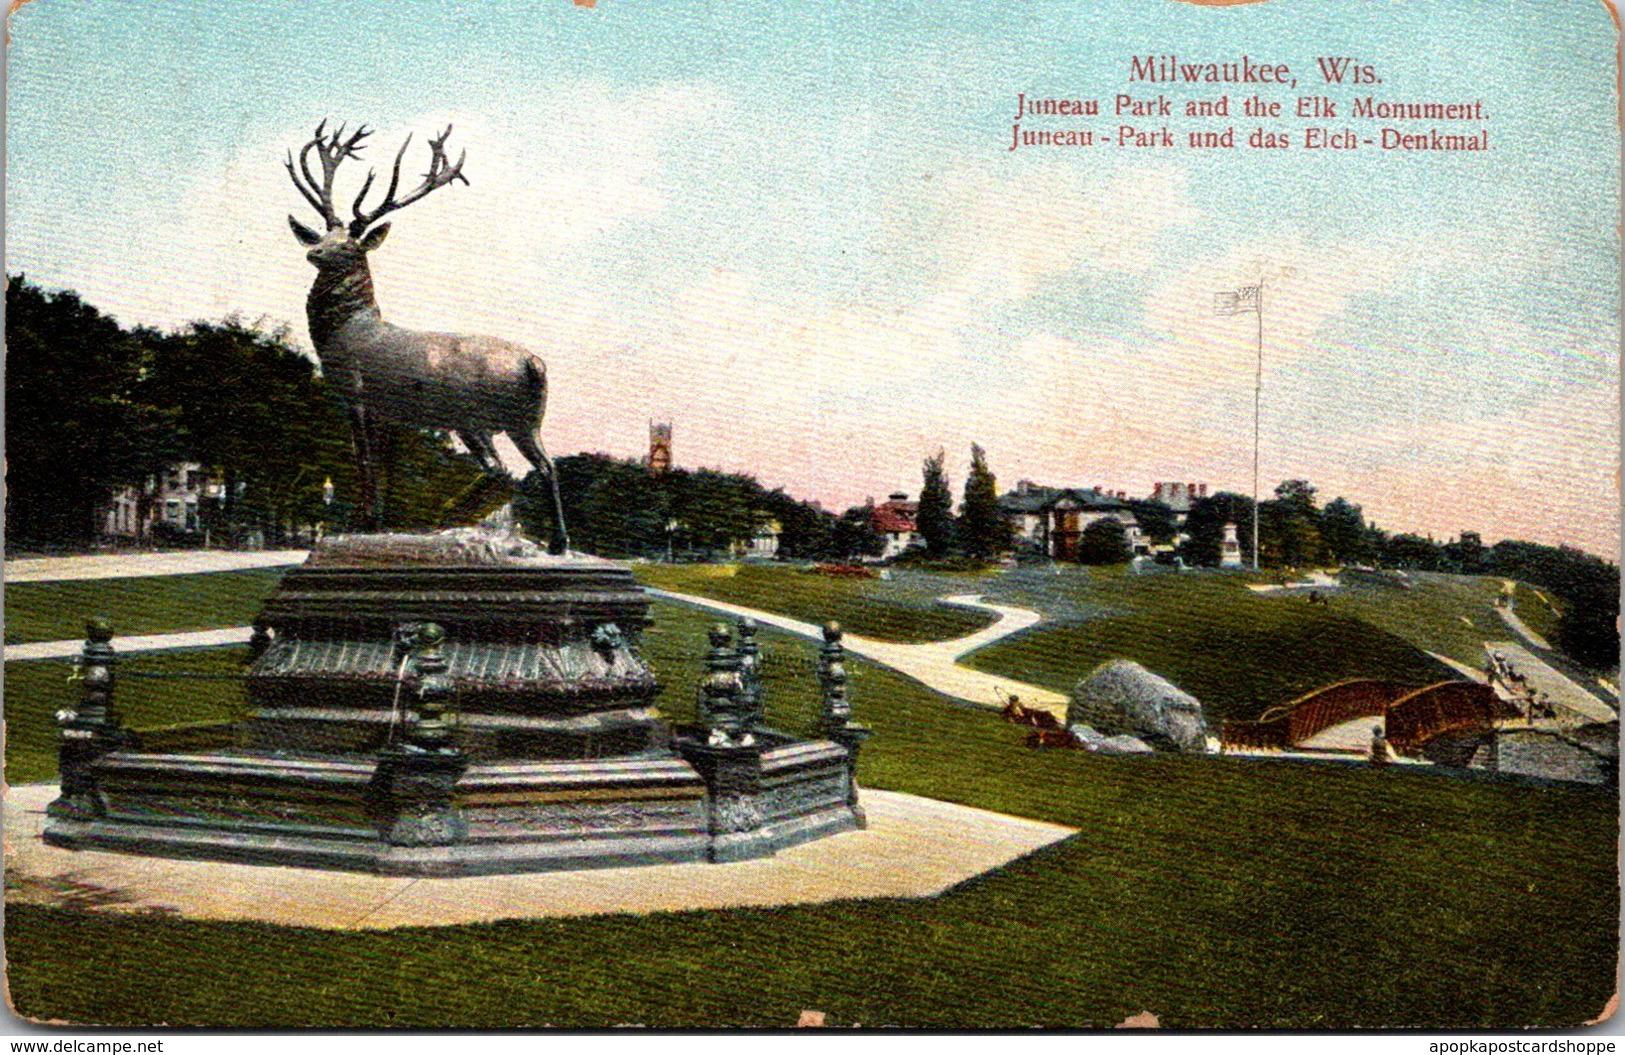 Wisconsin Milwaukee Juneau Park and Elk Monument